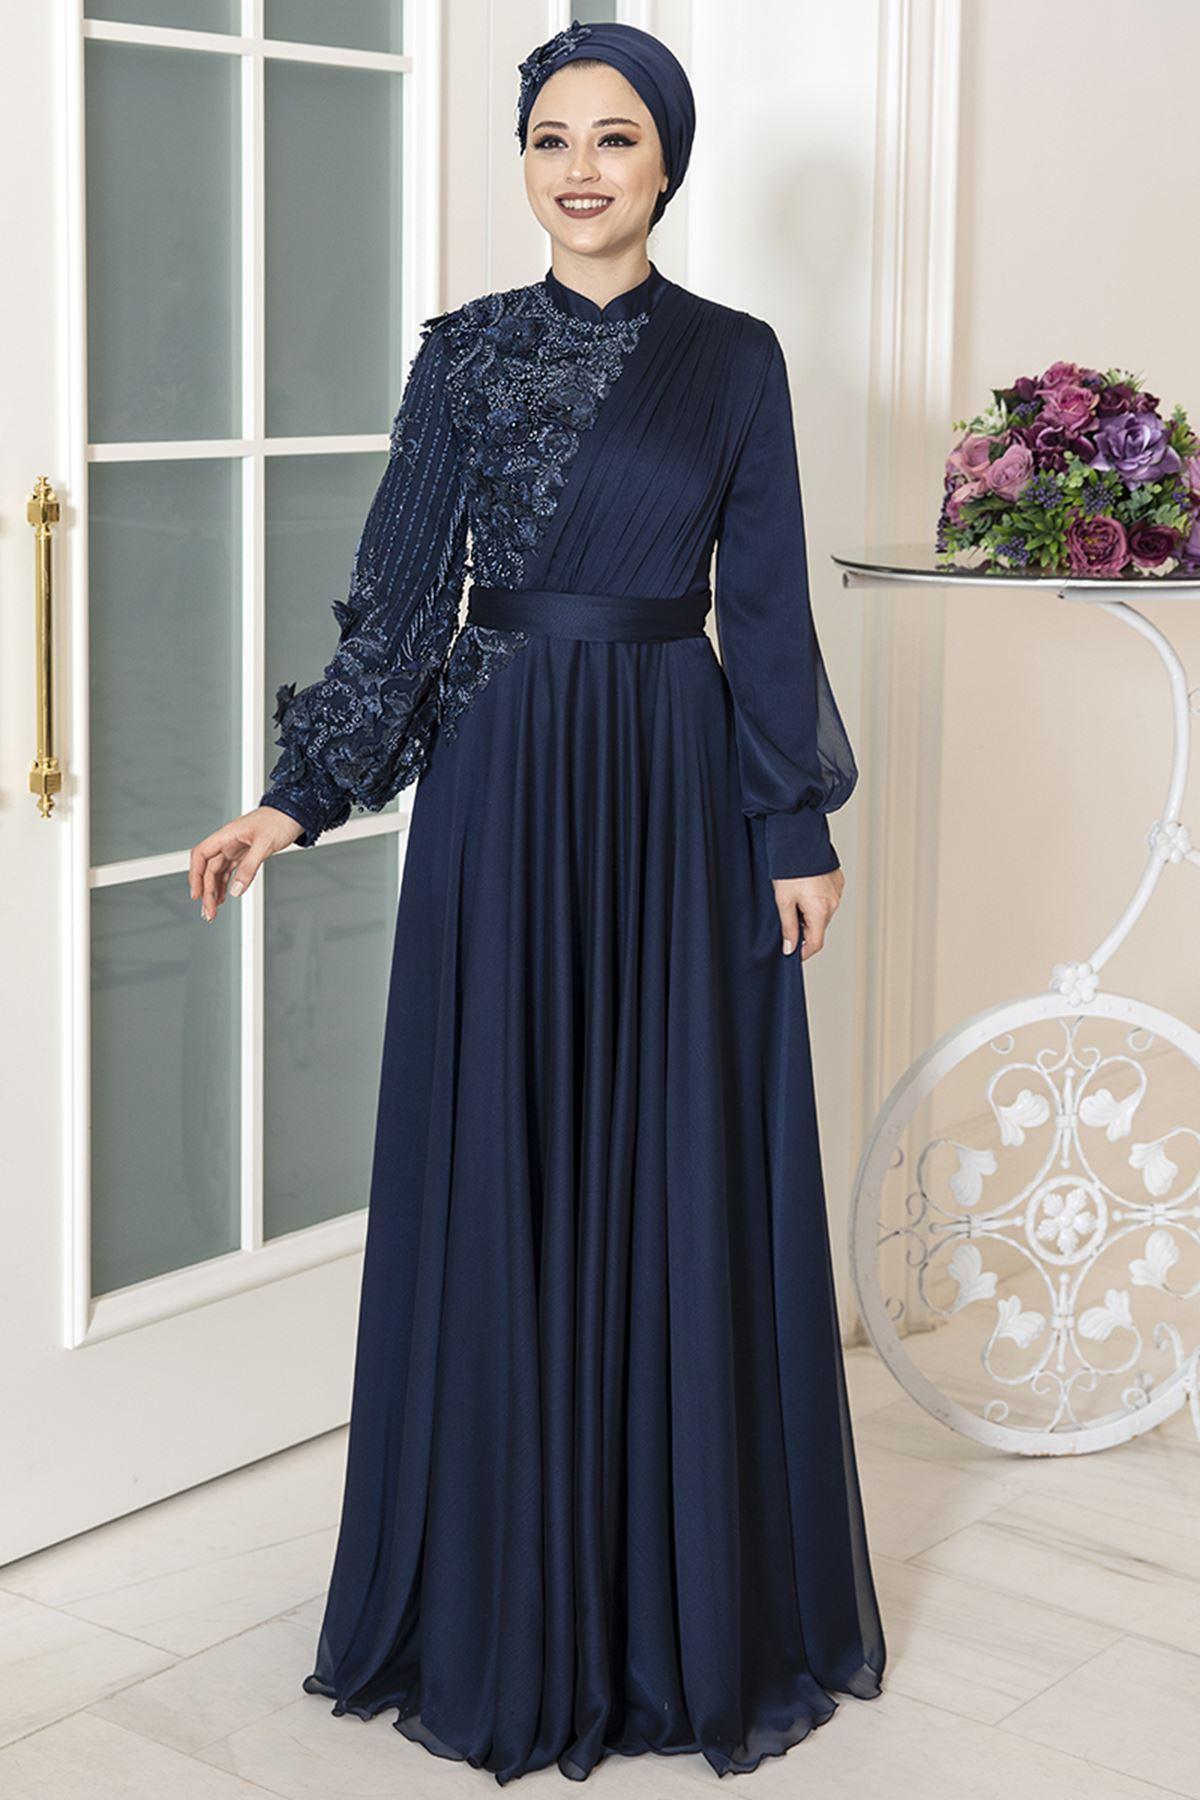 Al Marah Melisa Abiye Lacivert ALM3019